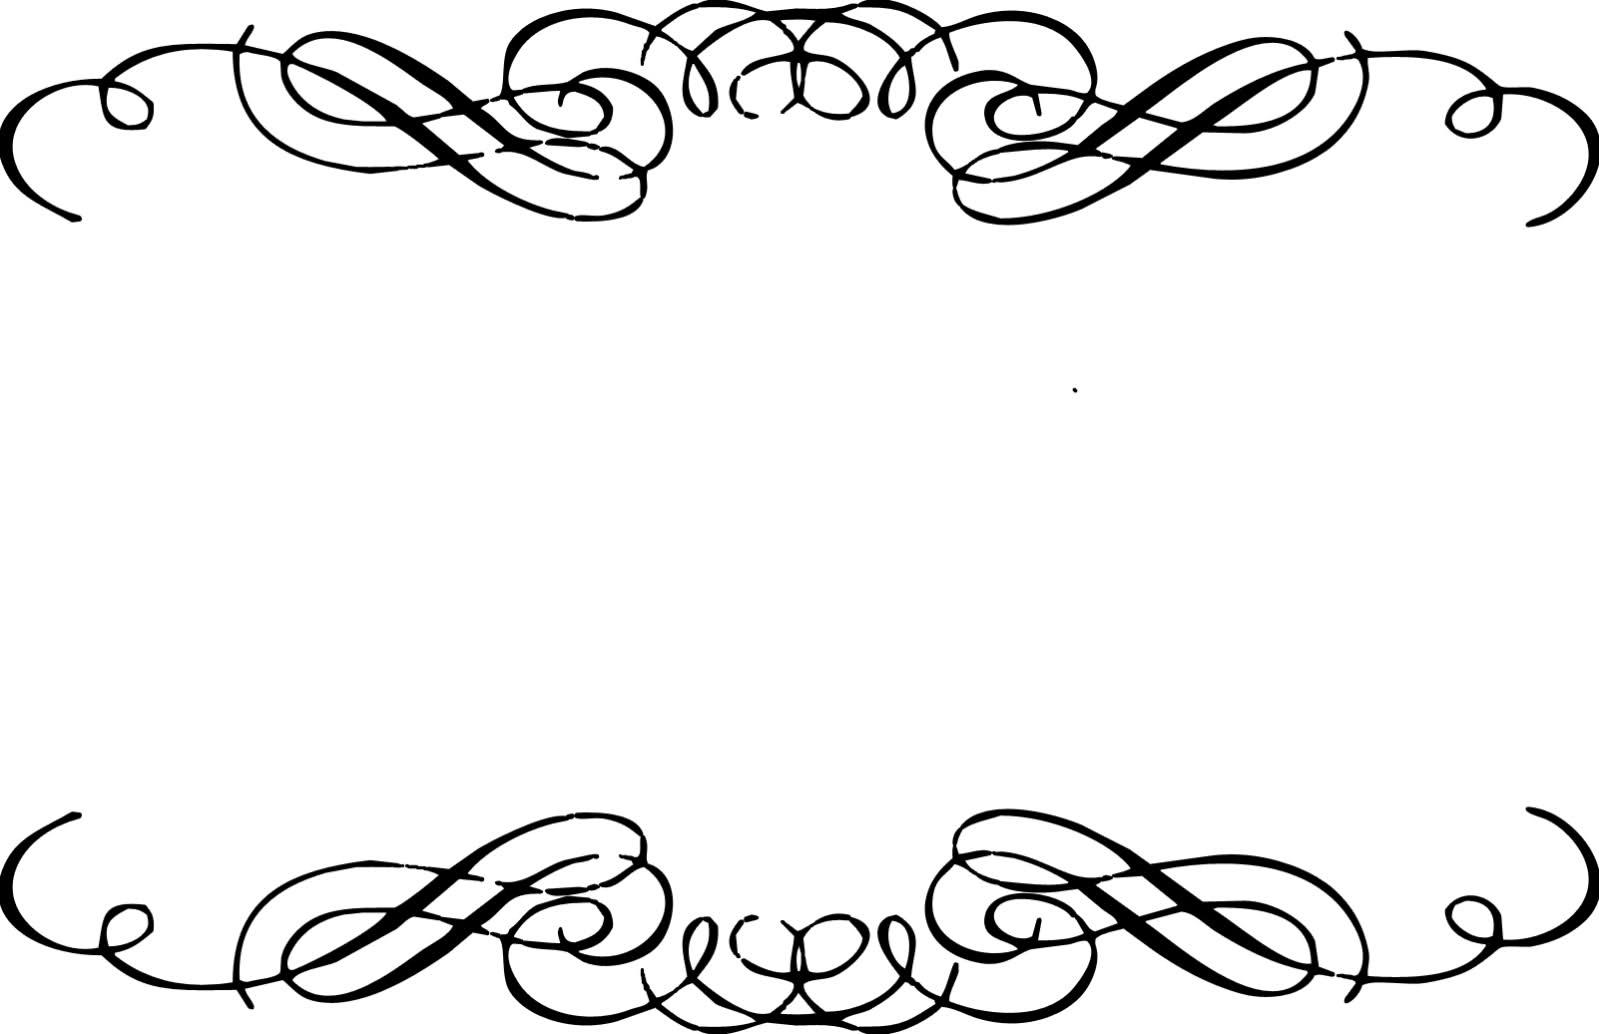 1599x1034 Western Clipart Scrollwork